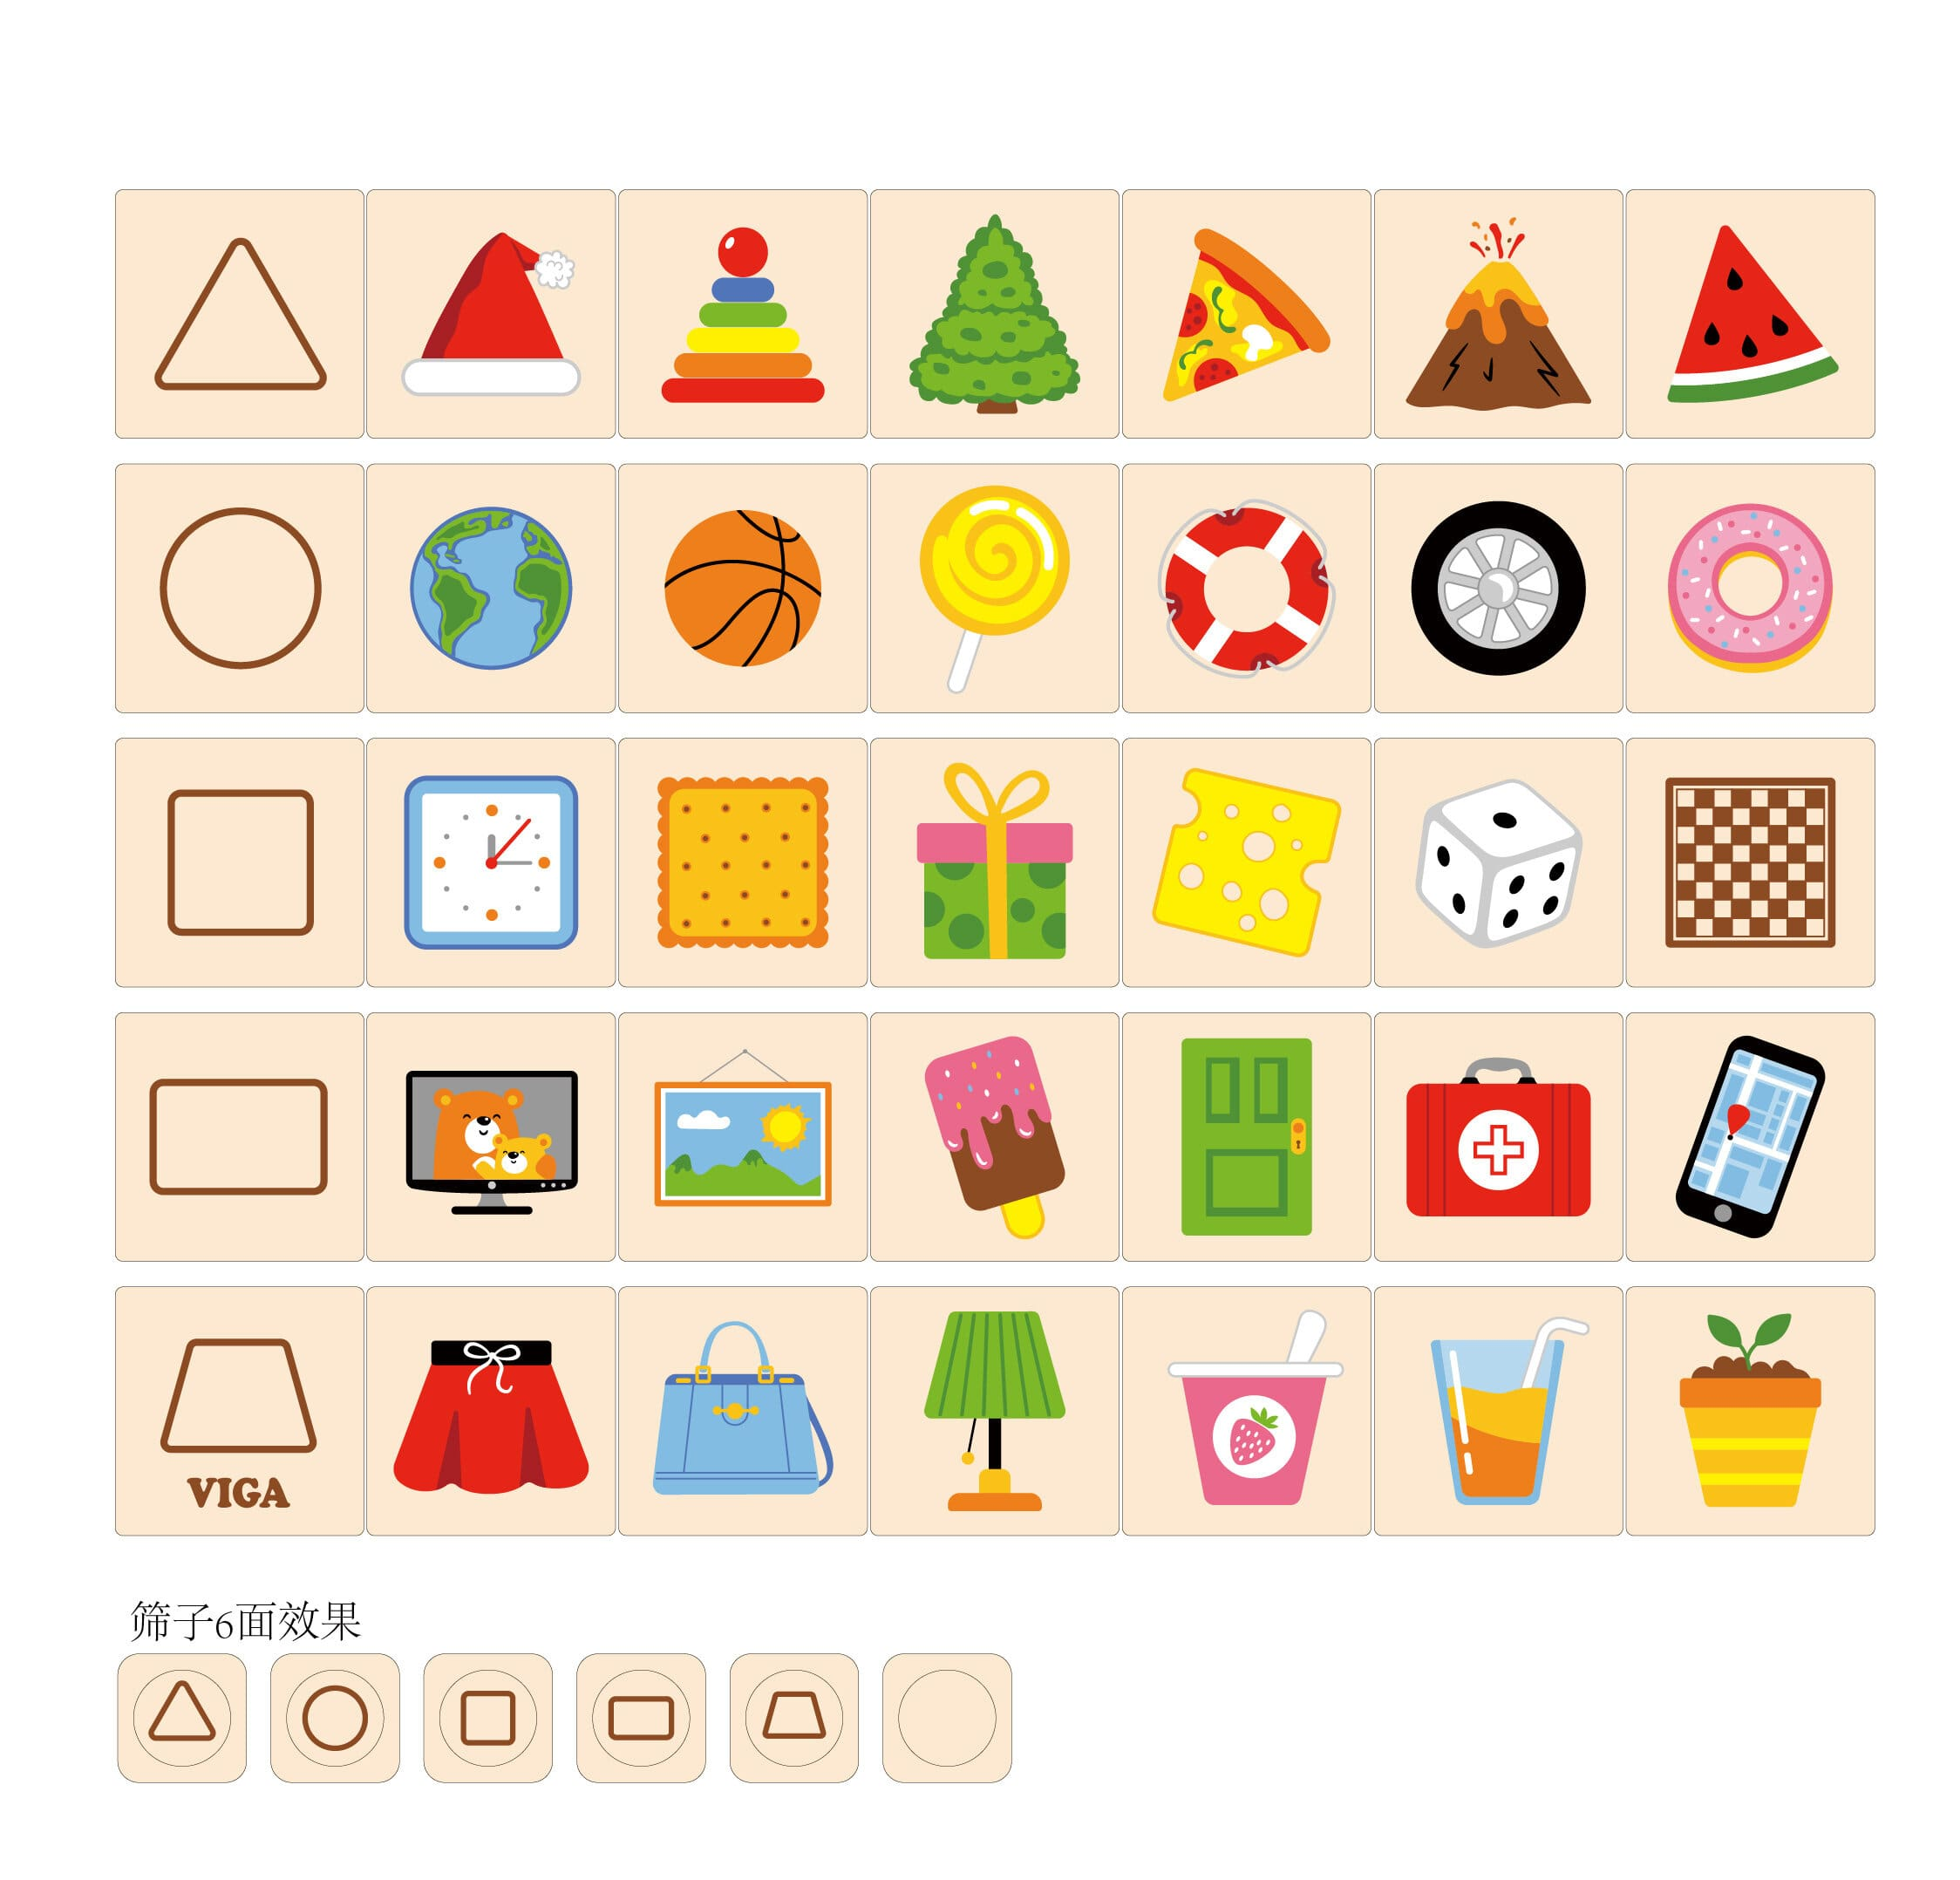 Образователнa игра Уча геометричните форми от Viga toys-bellamiestore